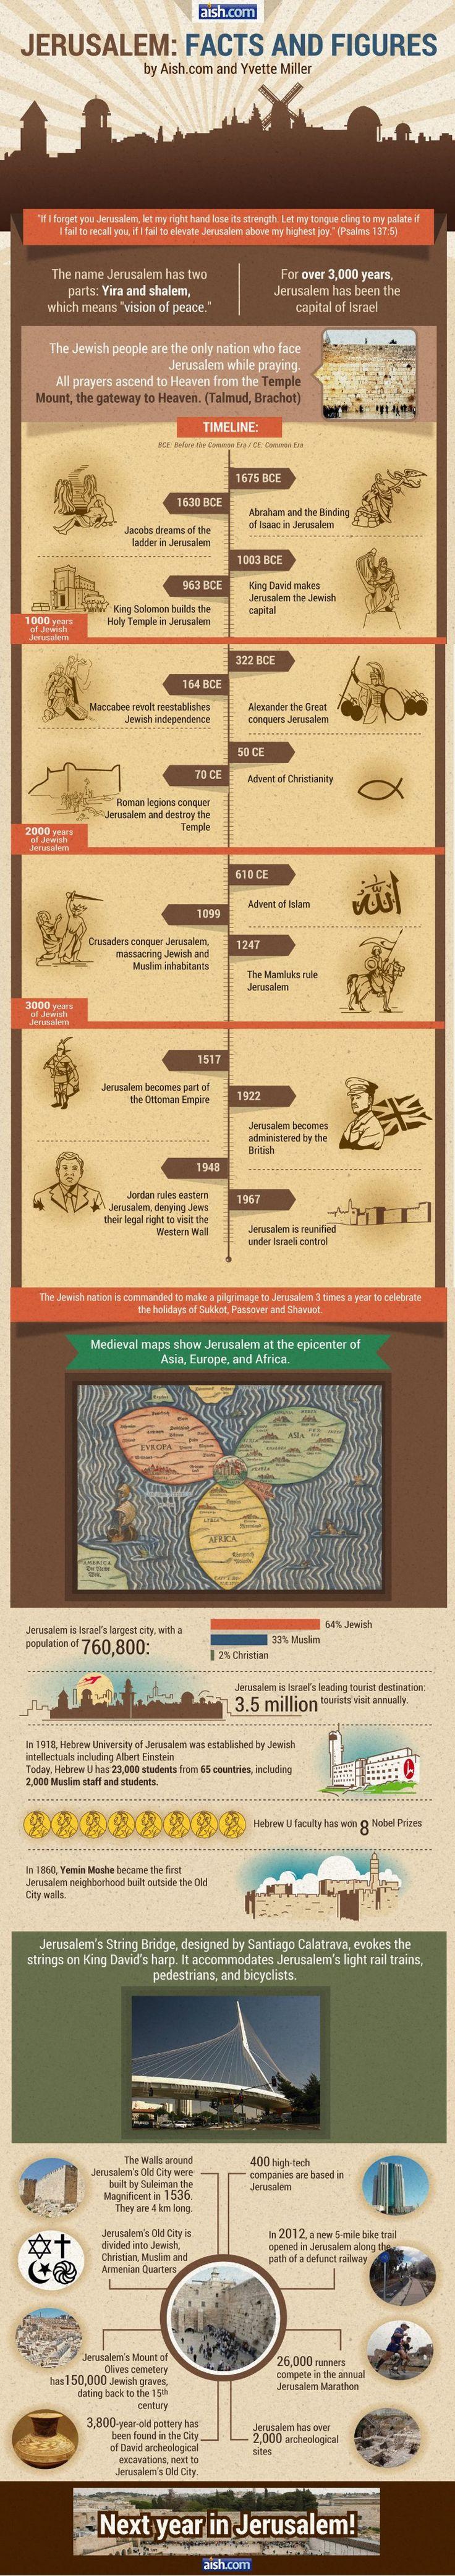 Jerusalem facts & figures